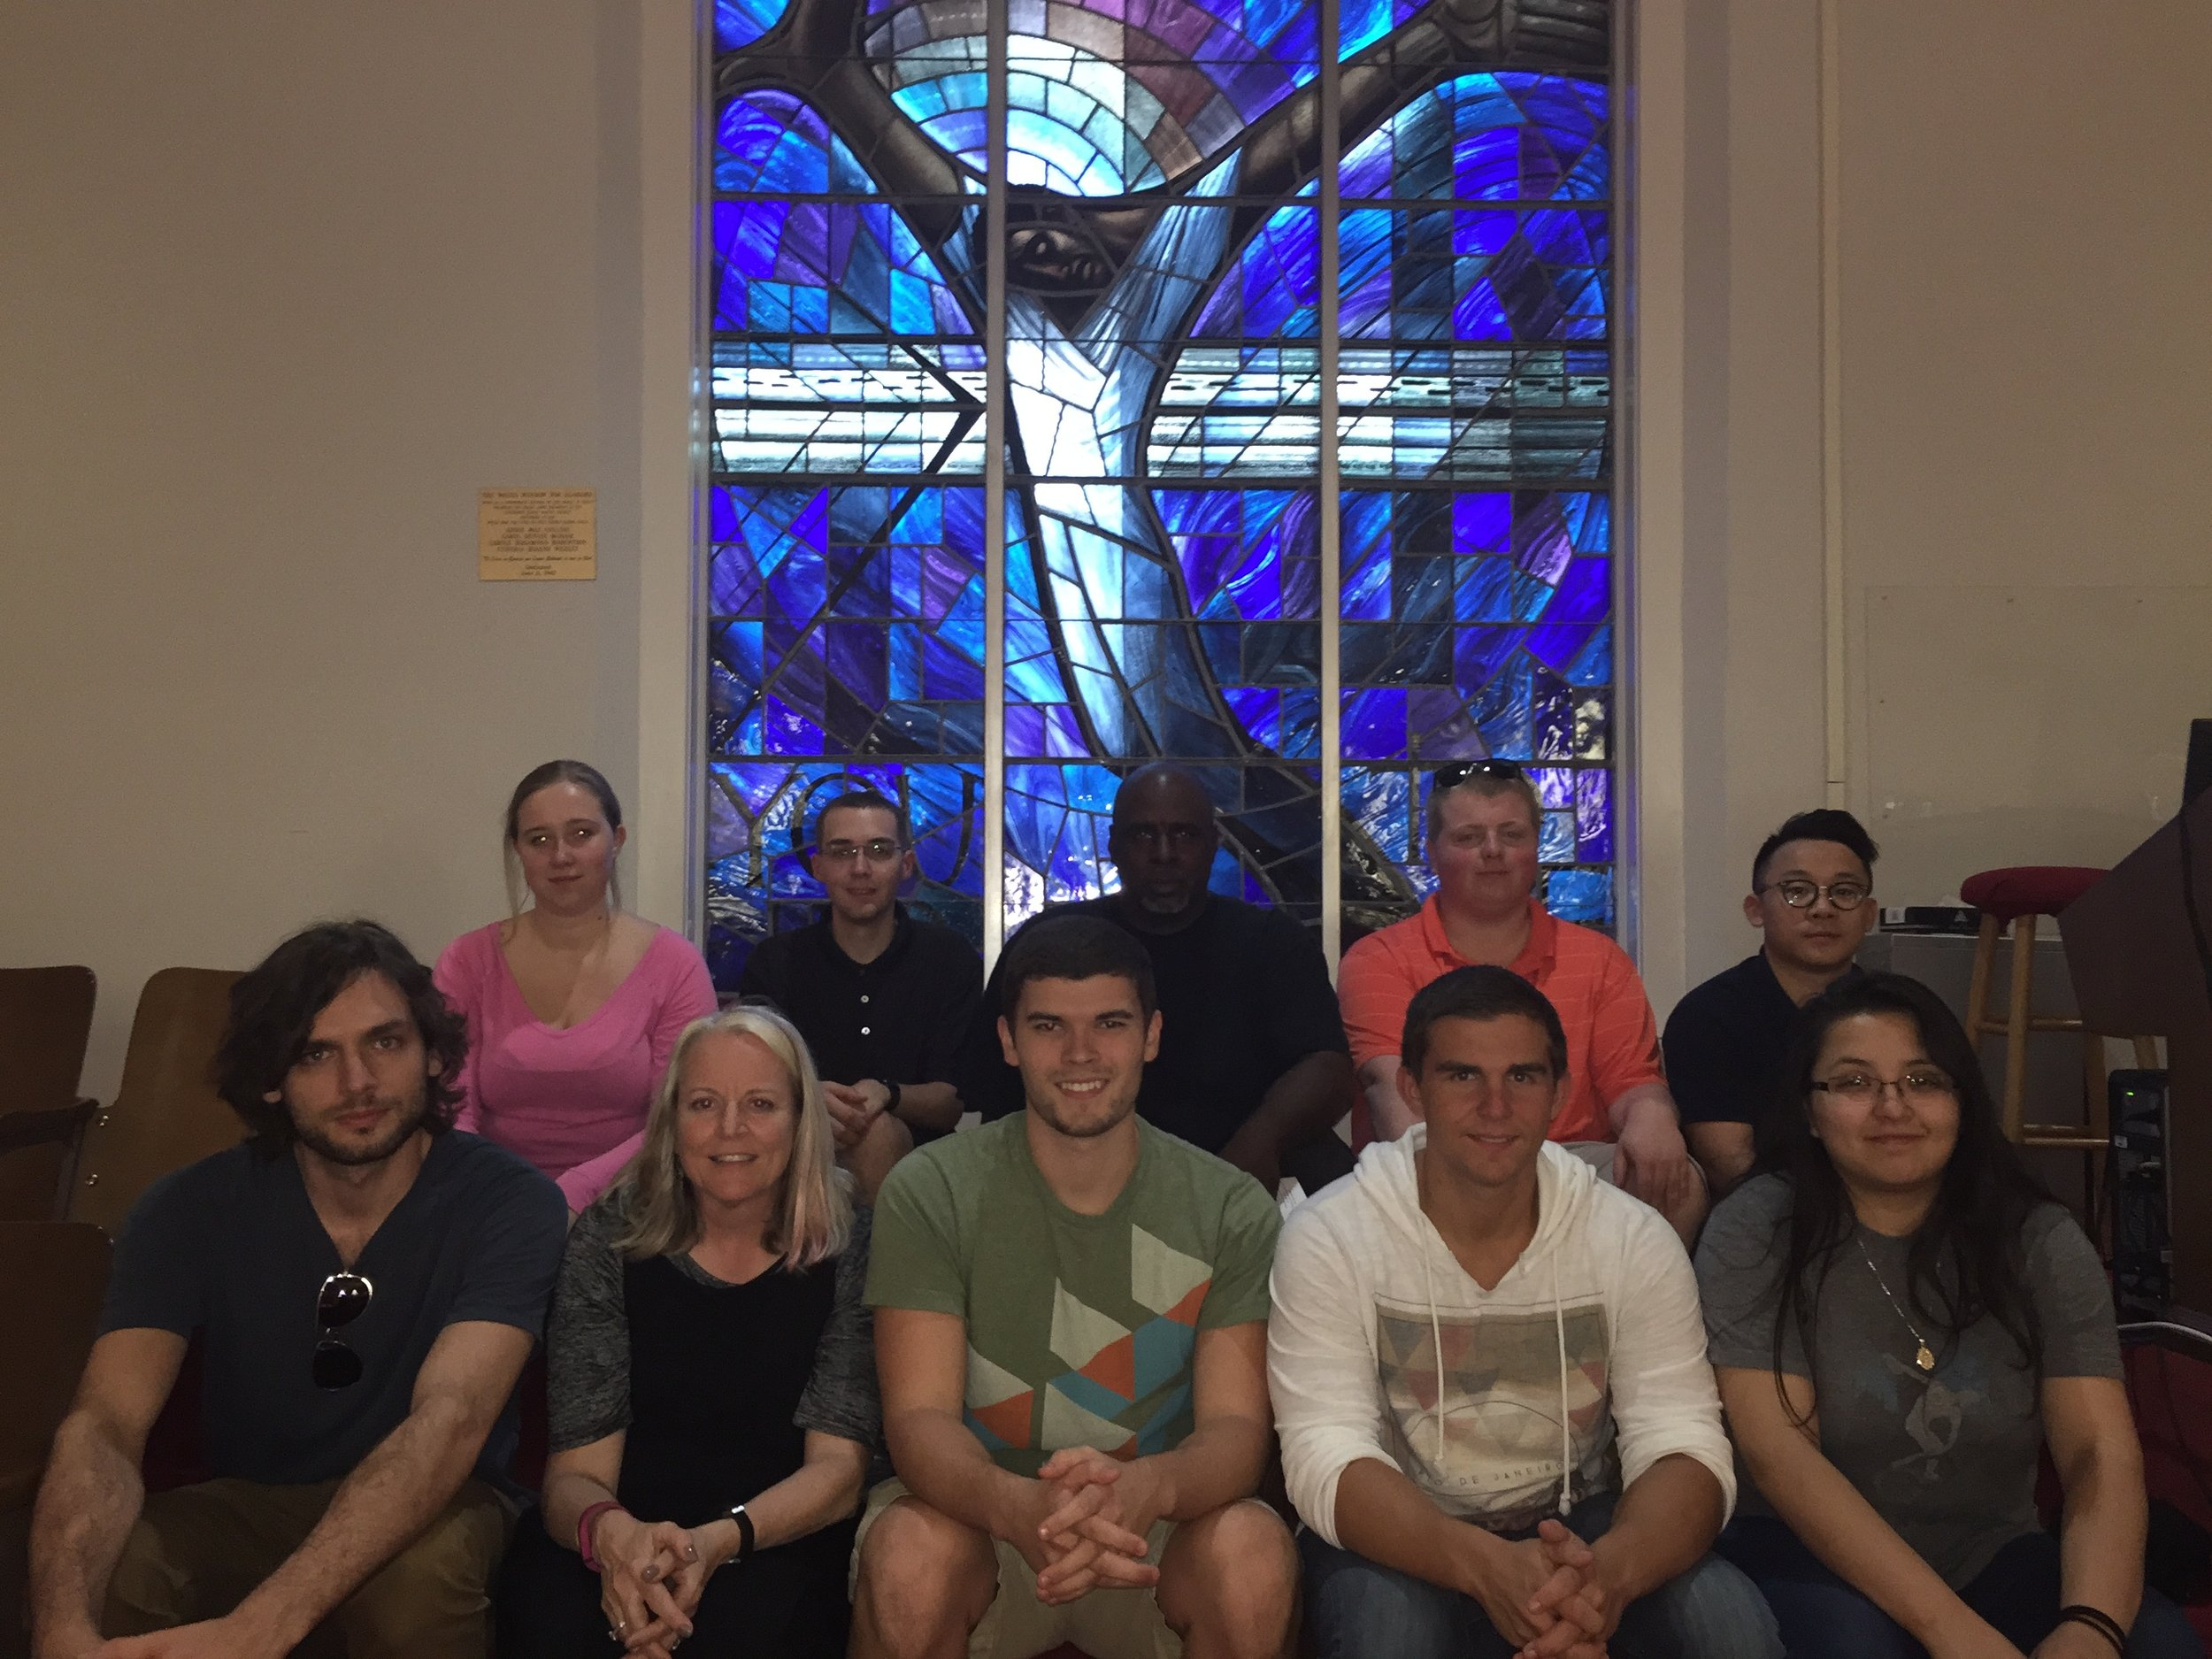 ARCH594-2015-Keddy-Group photo_16th Str Baptist Church.JPG